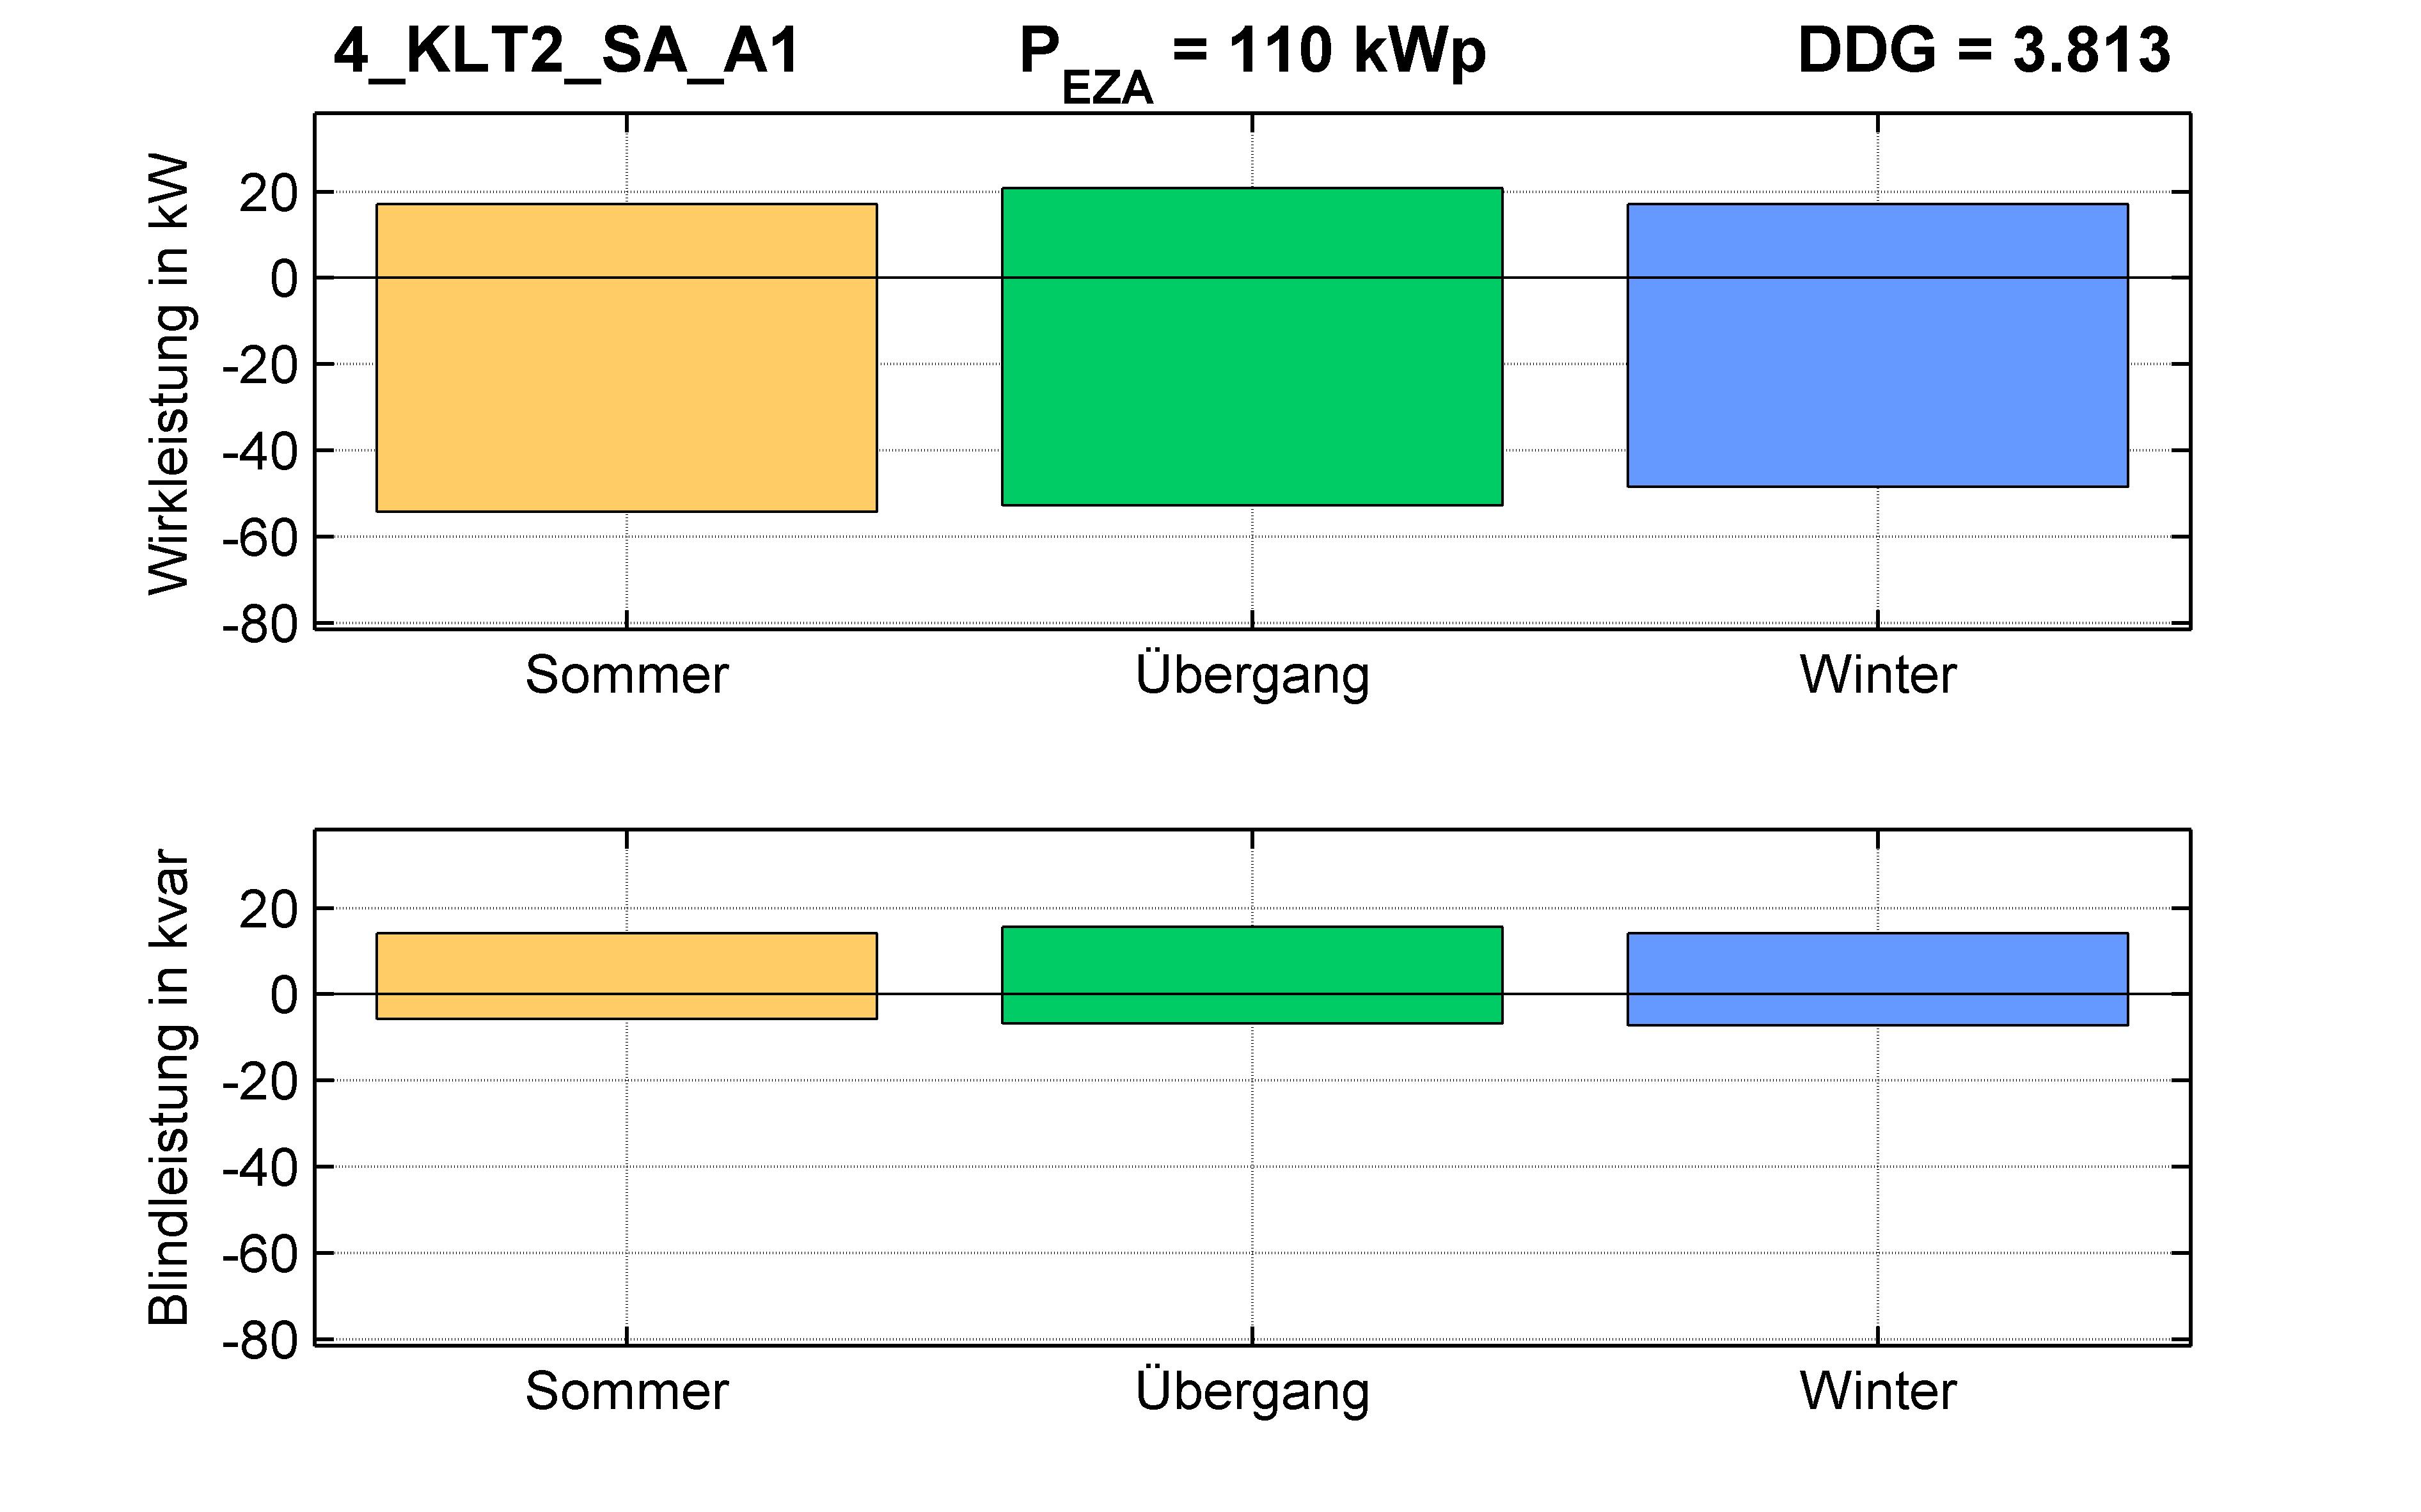 KLT2 | P-Kappung 55% (SA) A1 | PQ-Bilanz